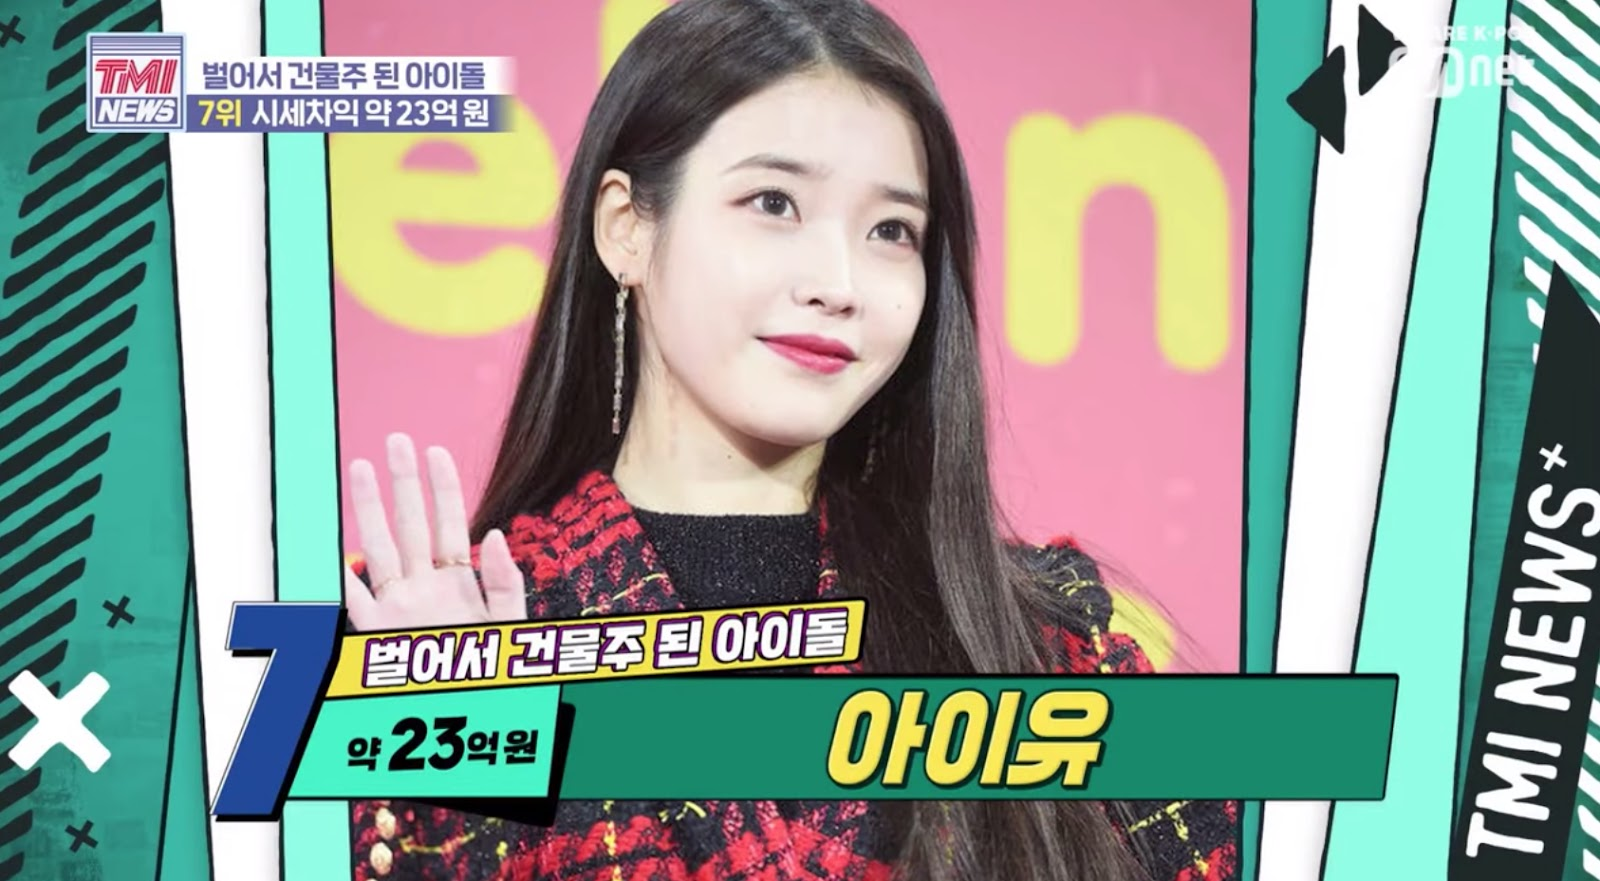 kpop real estate richest idols 2